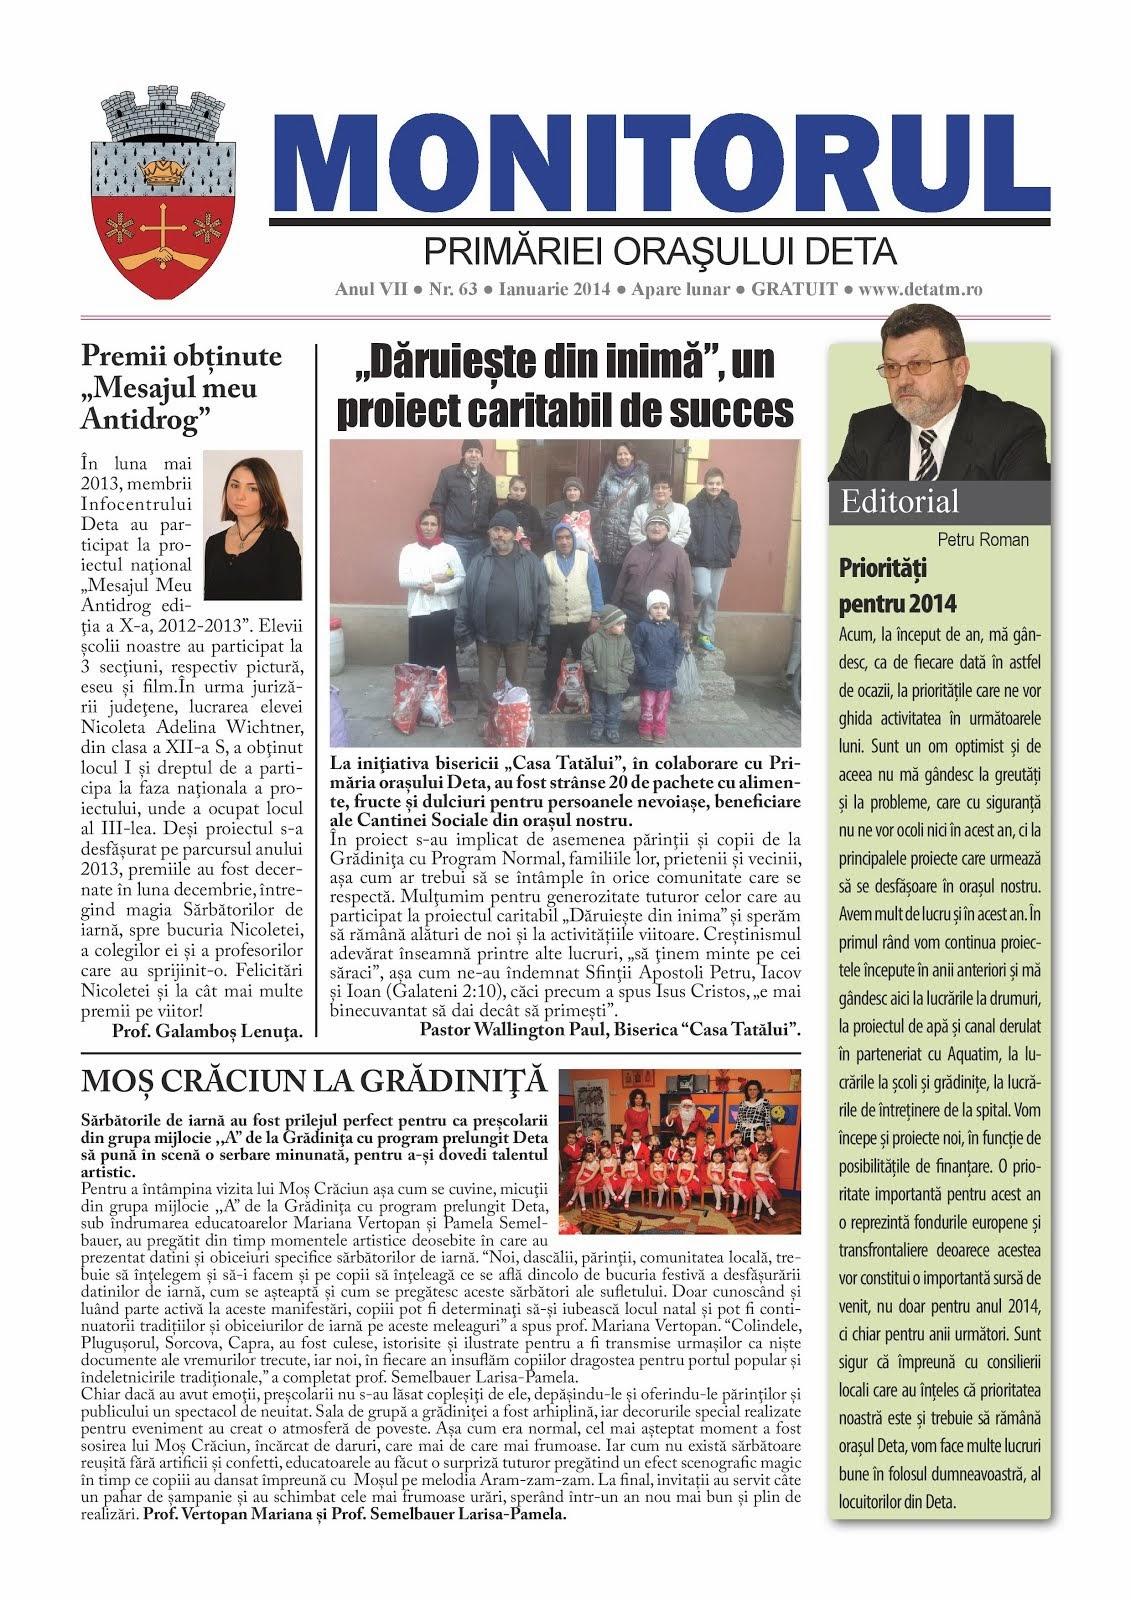 Monitorul - ianuarie 2014